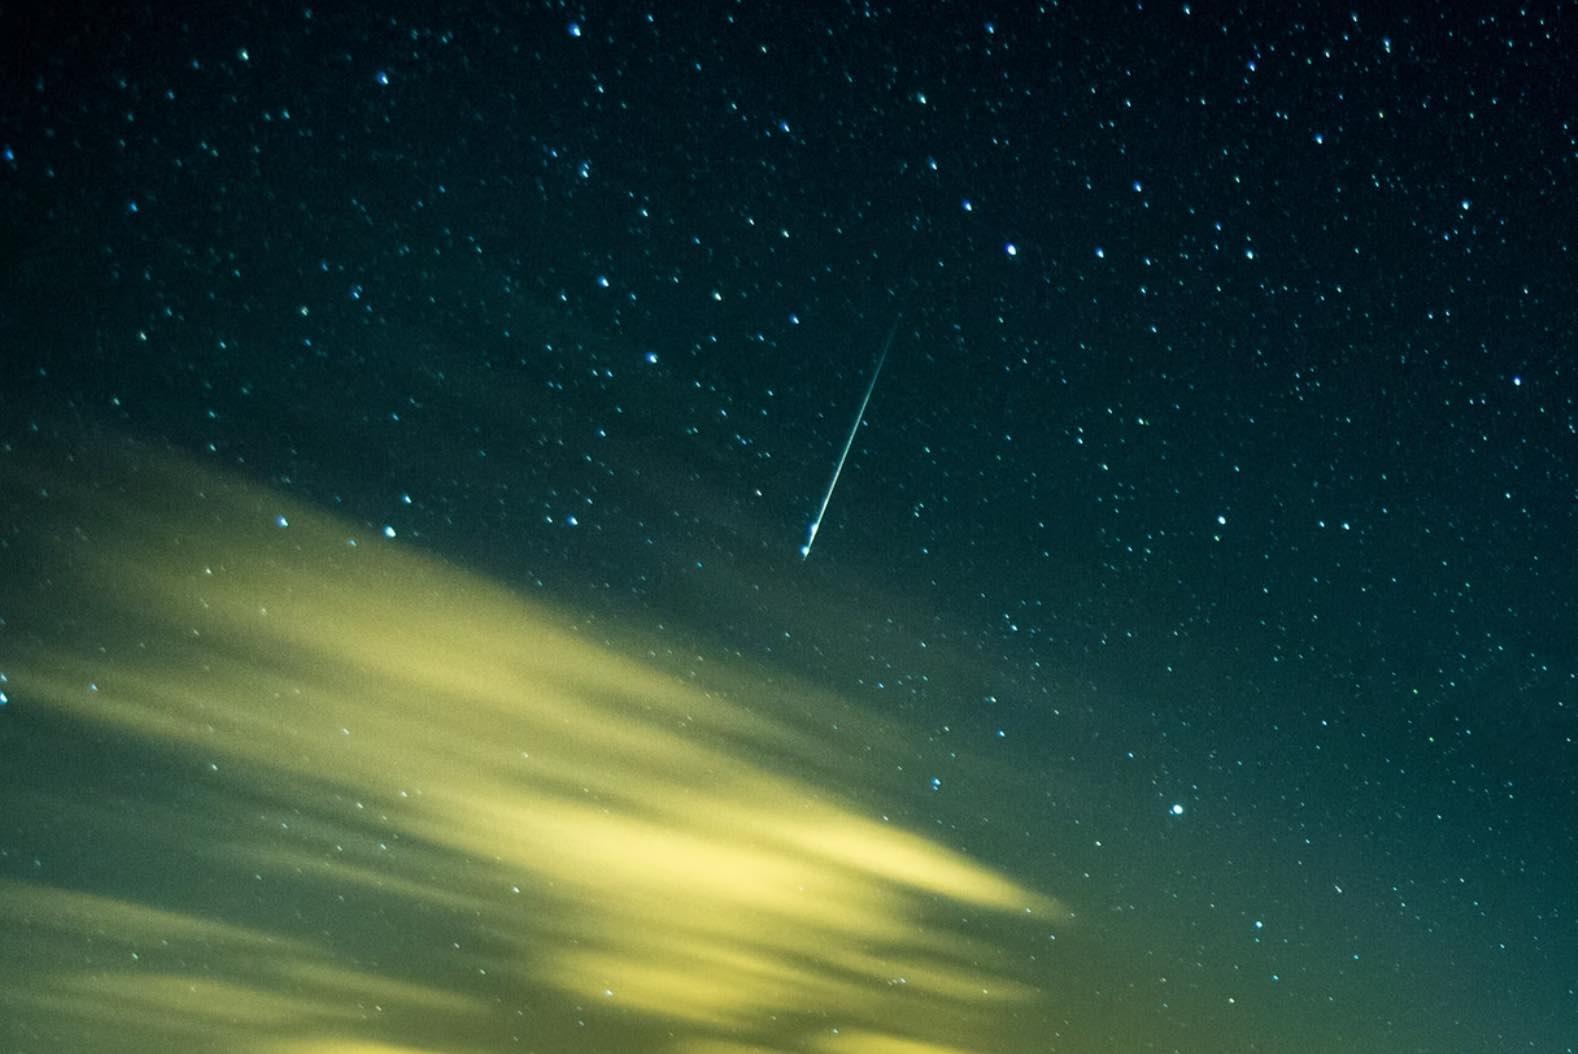 bright meteors